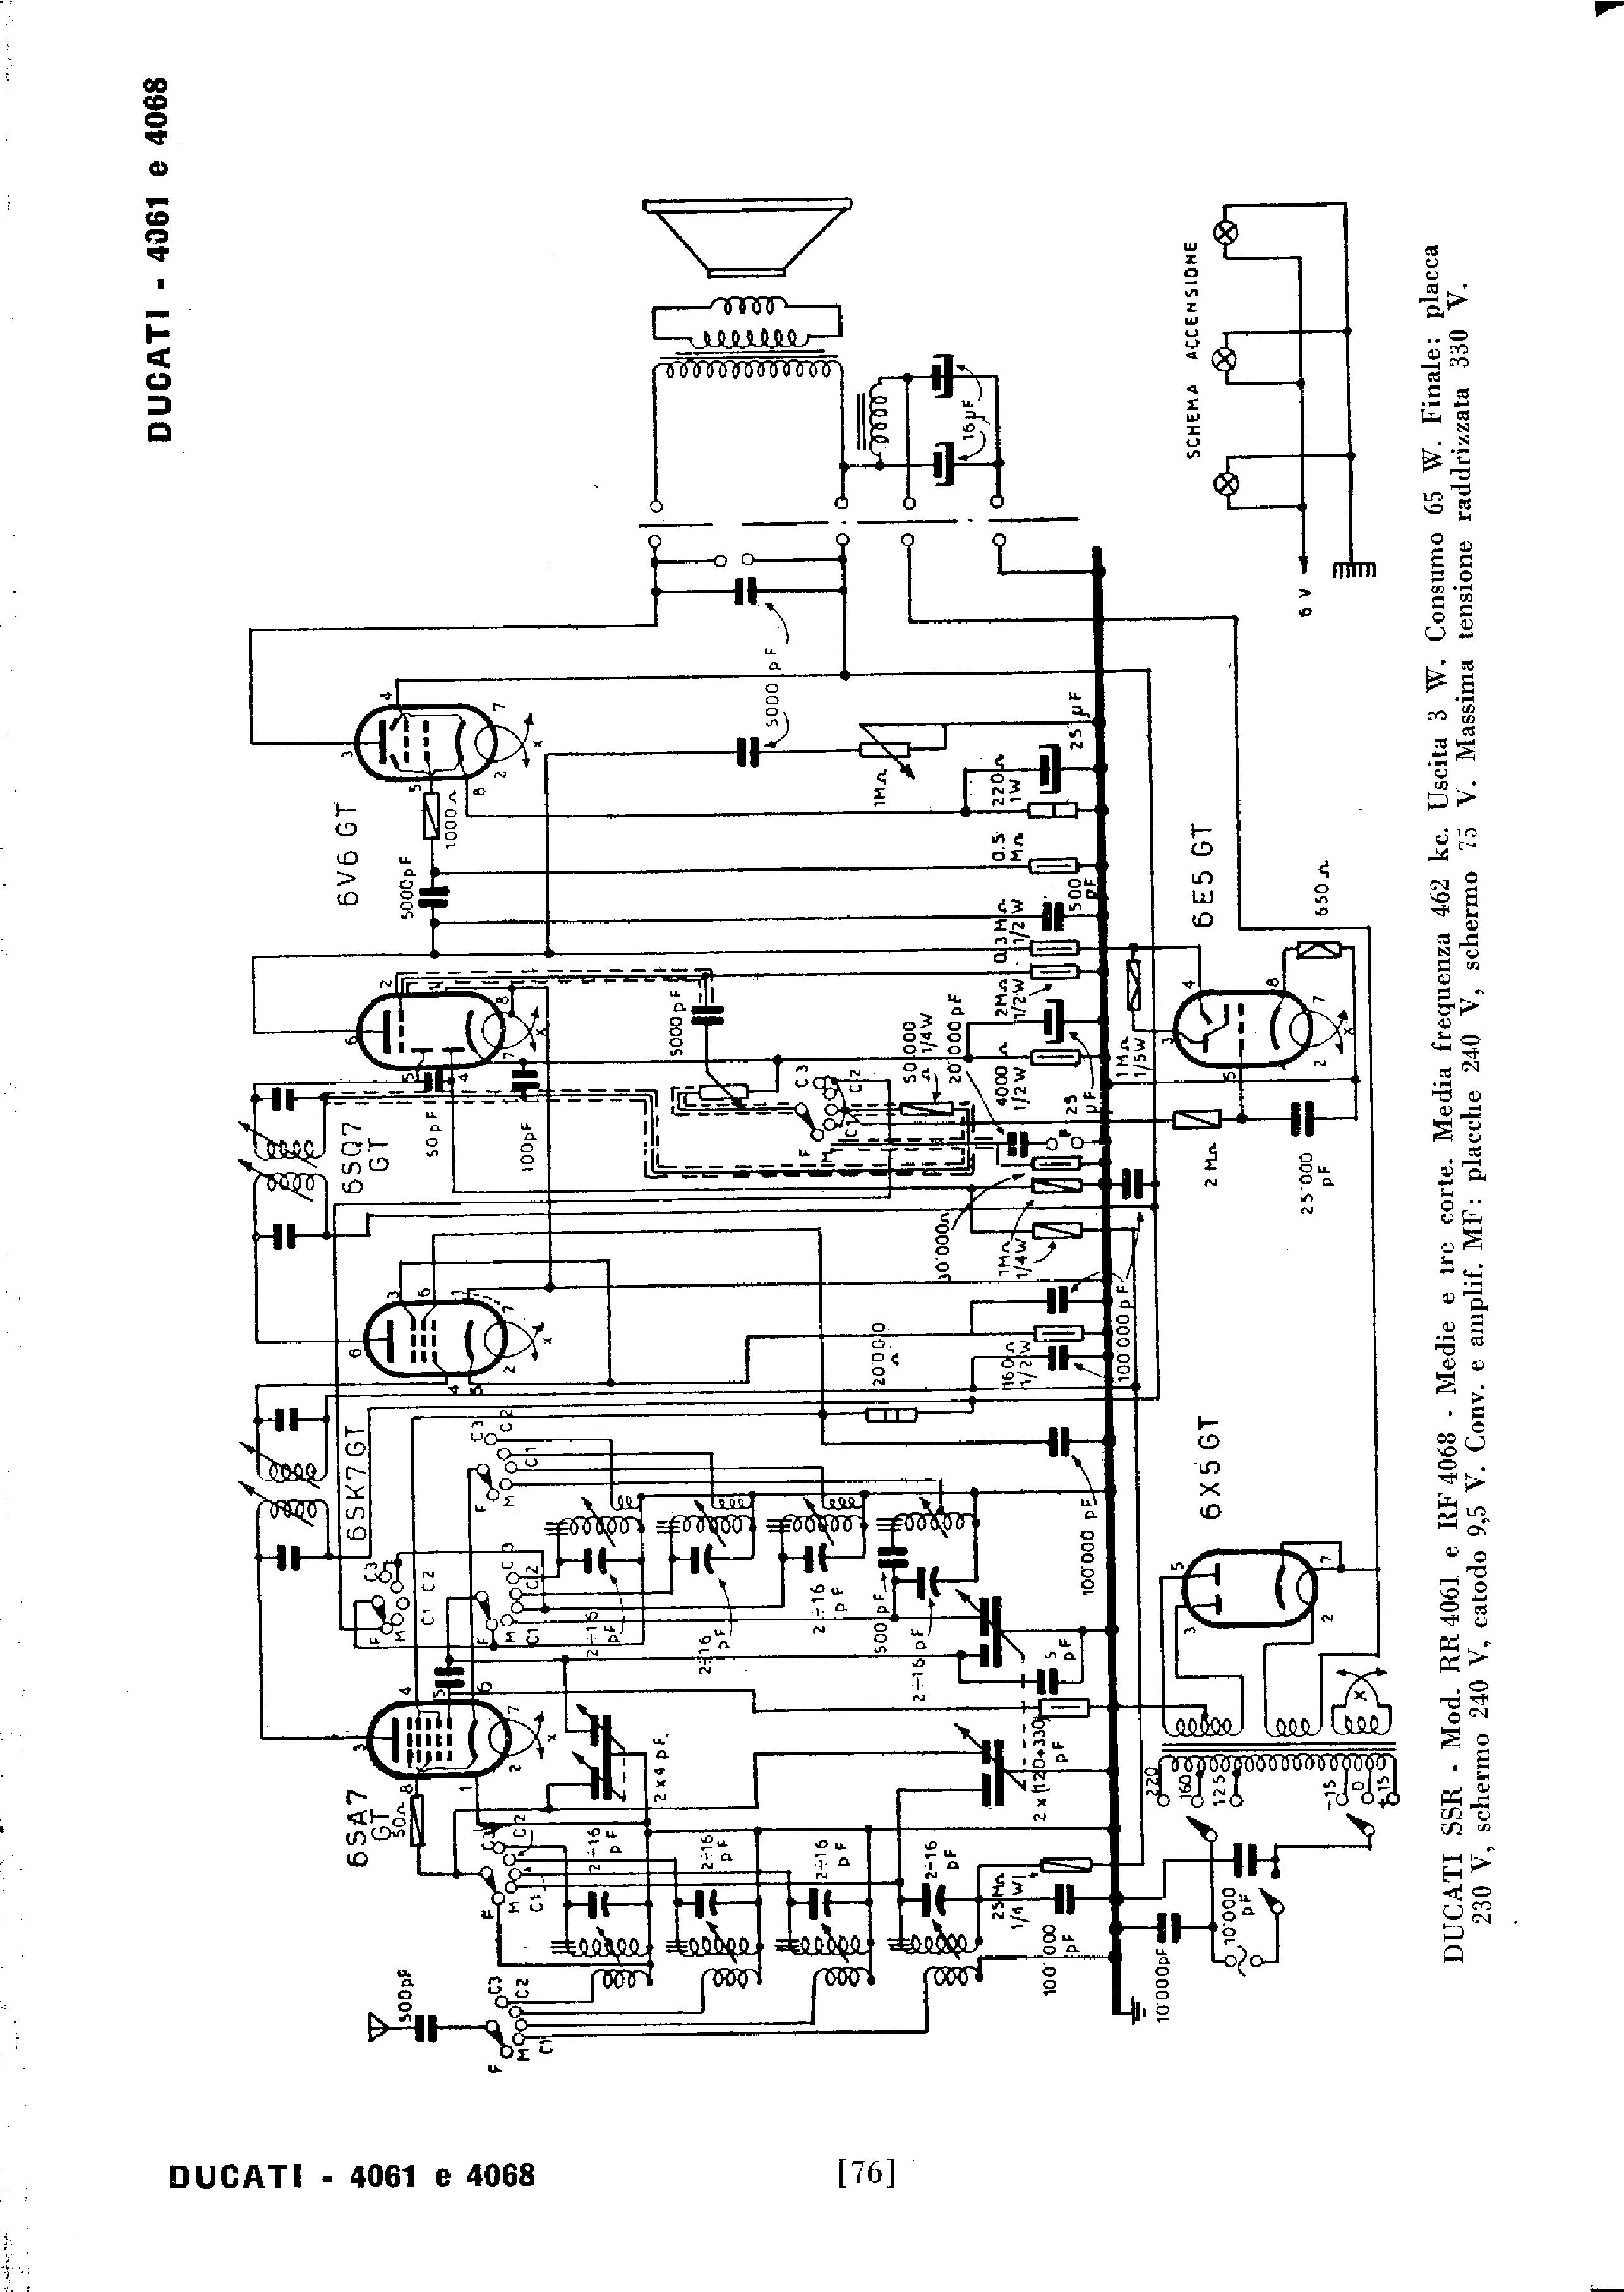 ducati rr4061 sch service manual download  schematics